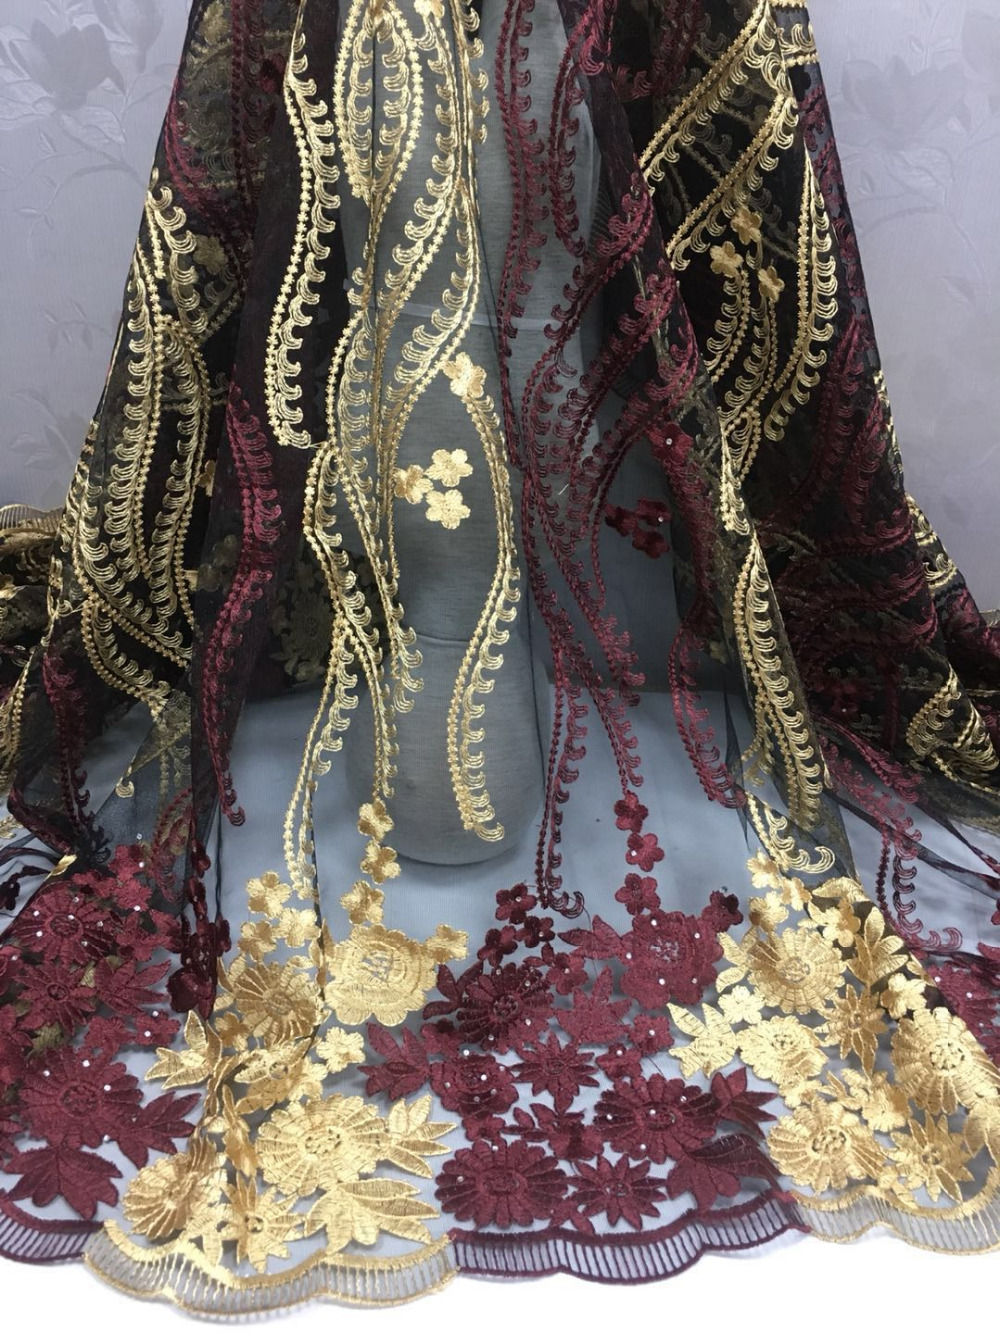 5yard new design french lace purple bridal embroidered tulle lace fabric french lace fabric.latest nigerian laces FC1626-WFA5yard new design french lace purple bridal embroidered tulle lace fabric french lace fabric.latest nigerian laces FC1626-WFA